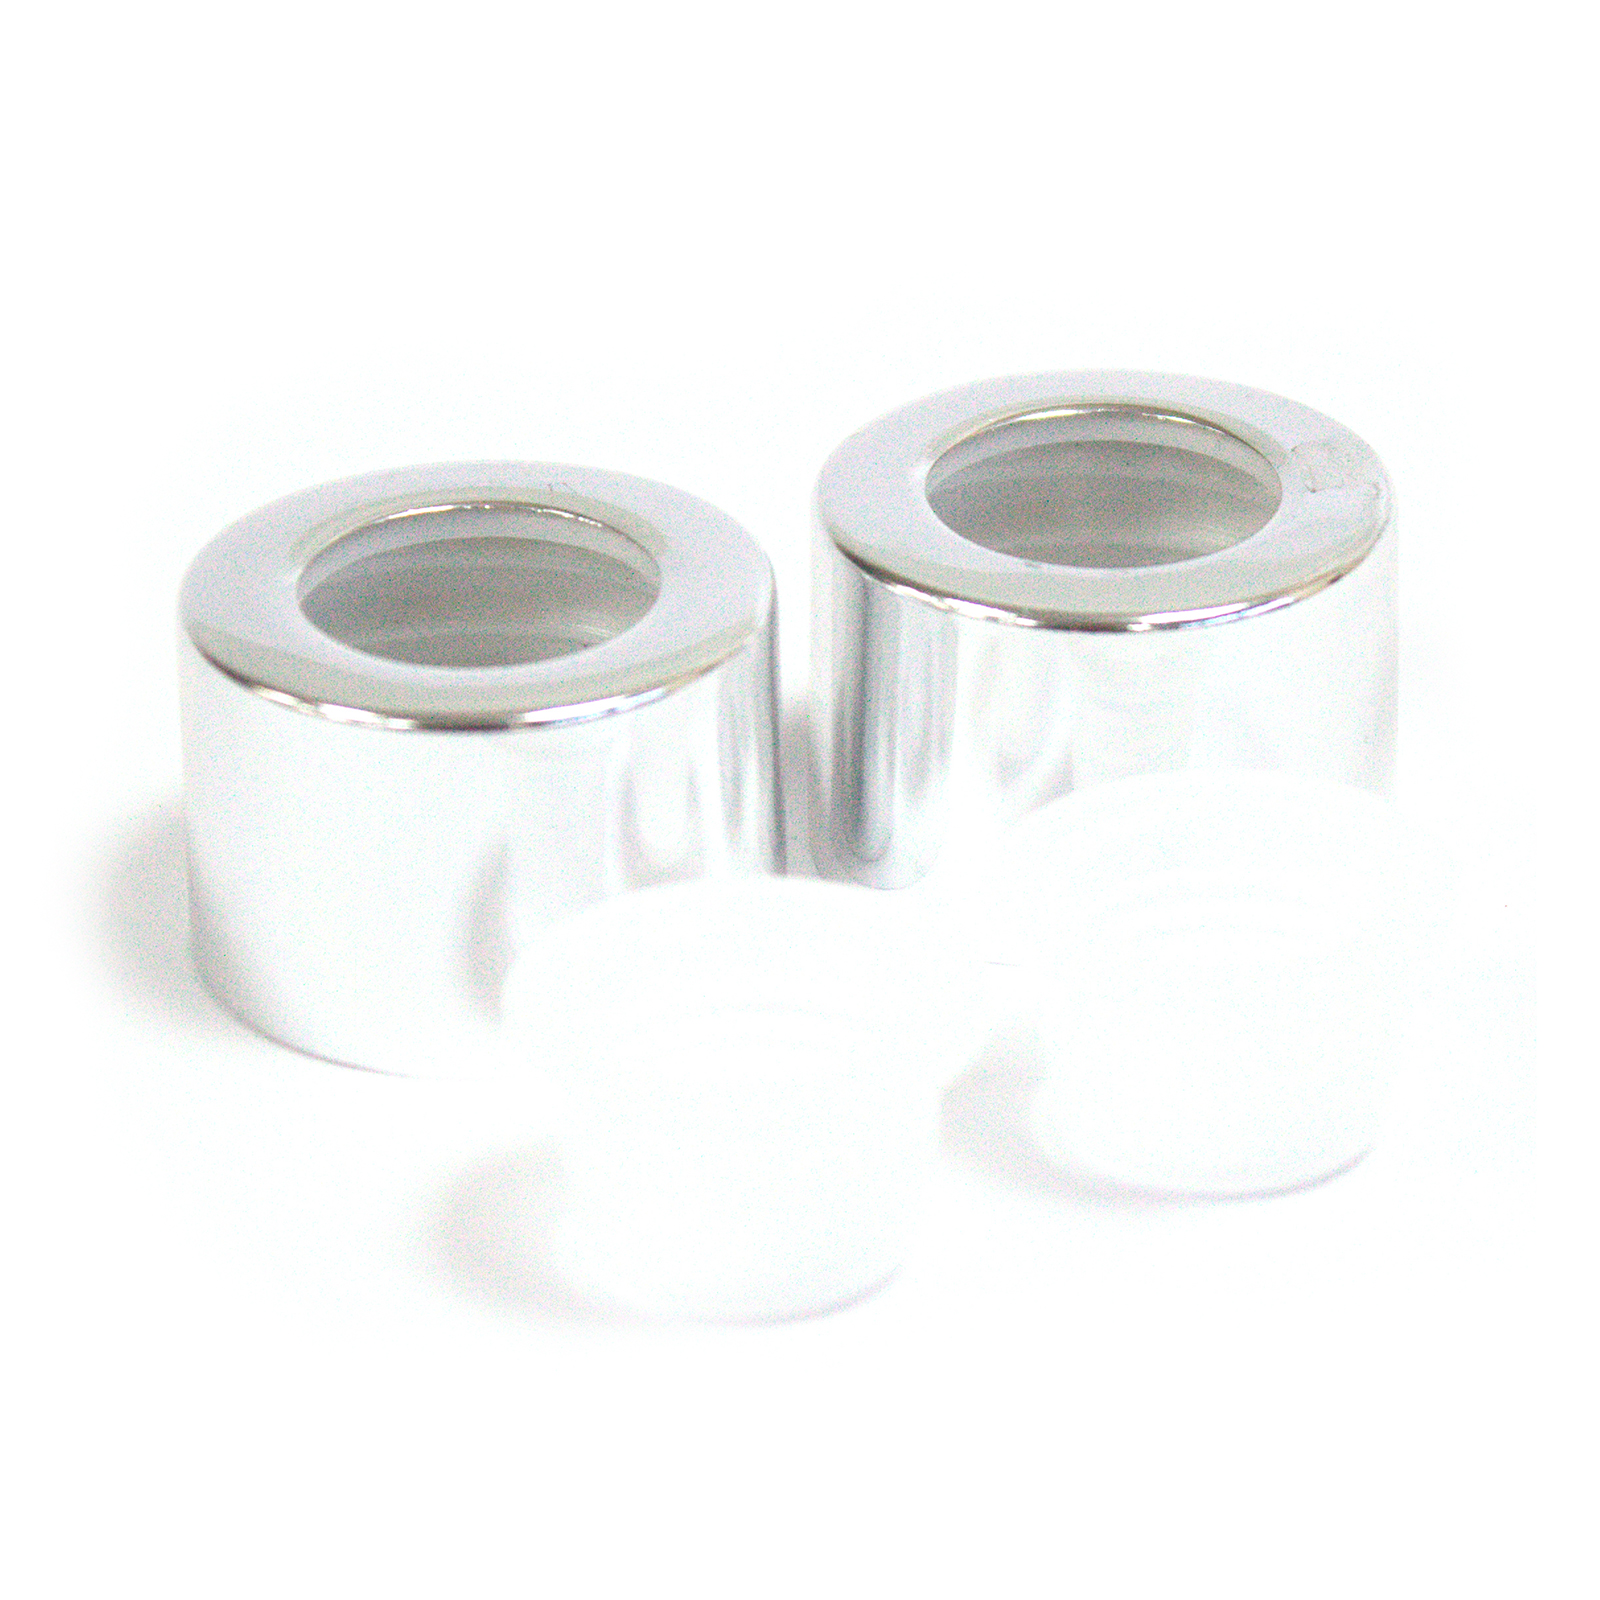 Cap for RDBot-14/15/16 2.5 cm - Silver Top - AWGifts ...